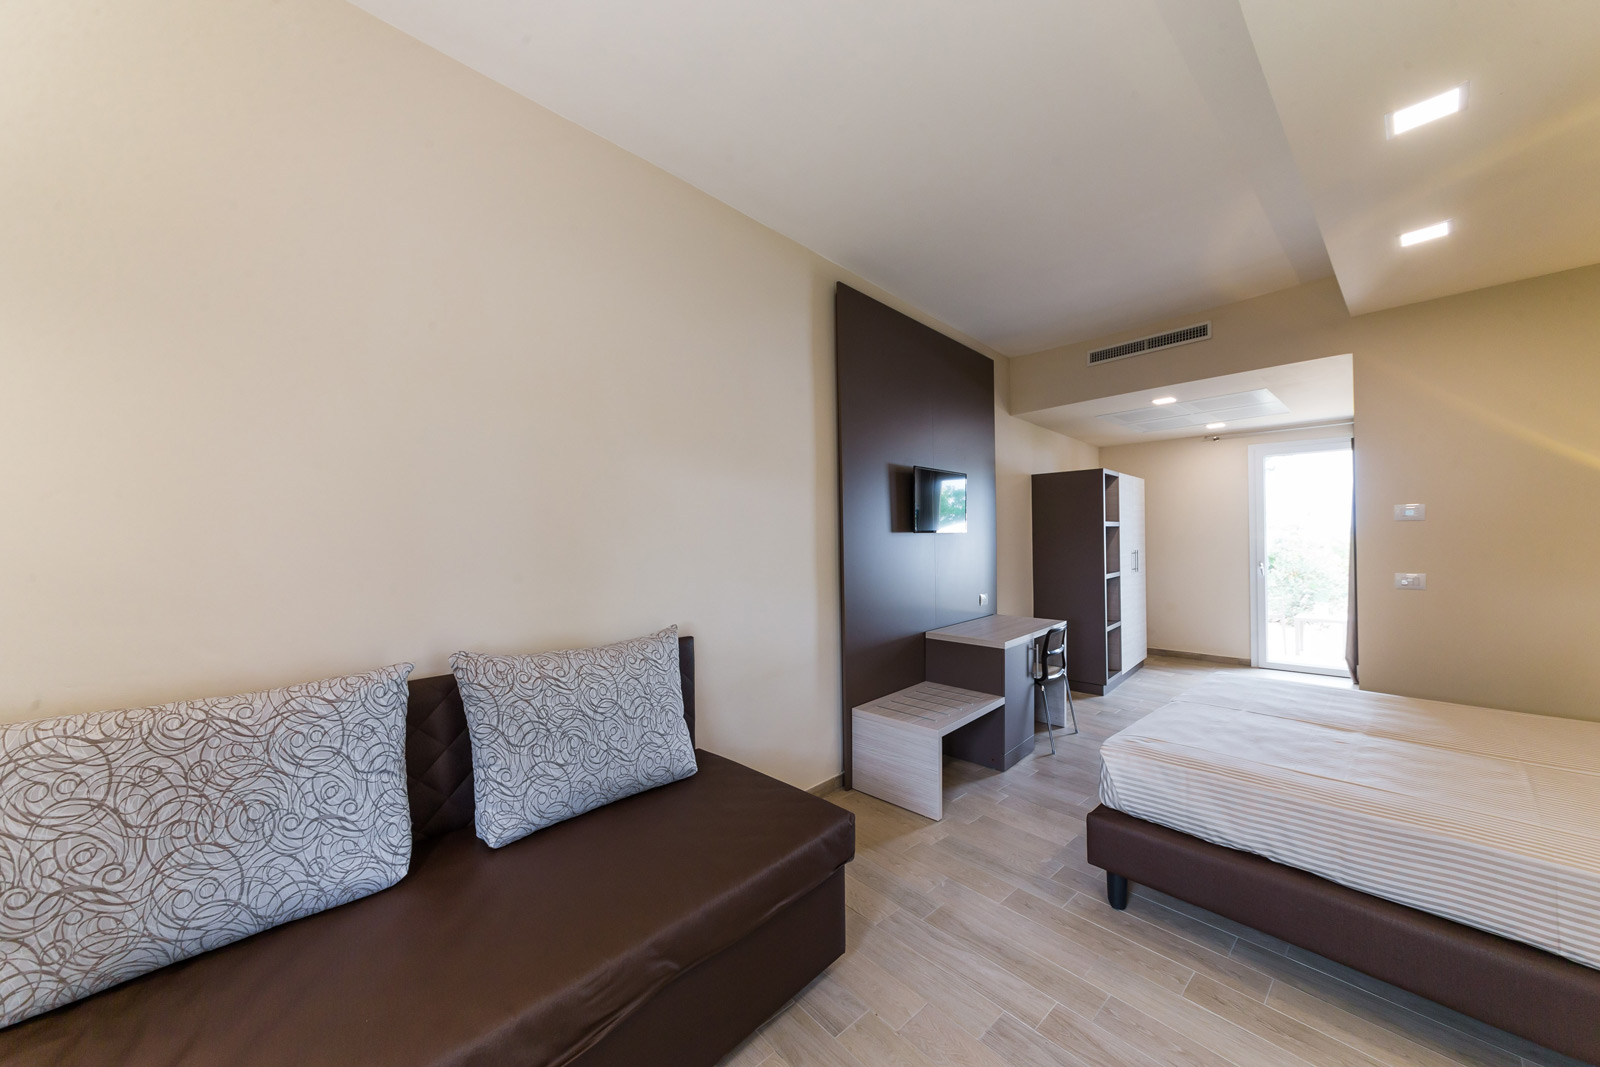 Suite at Torre Cintola